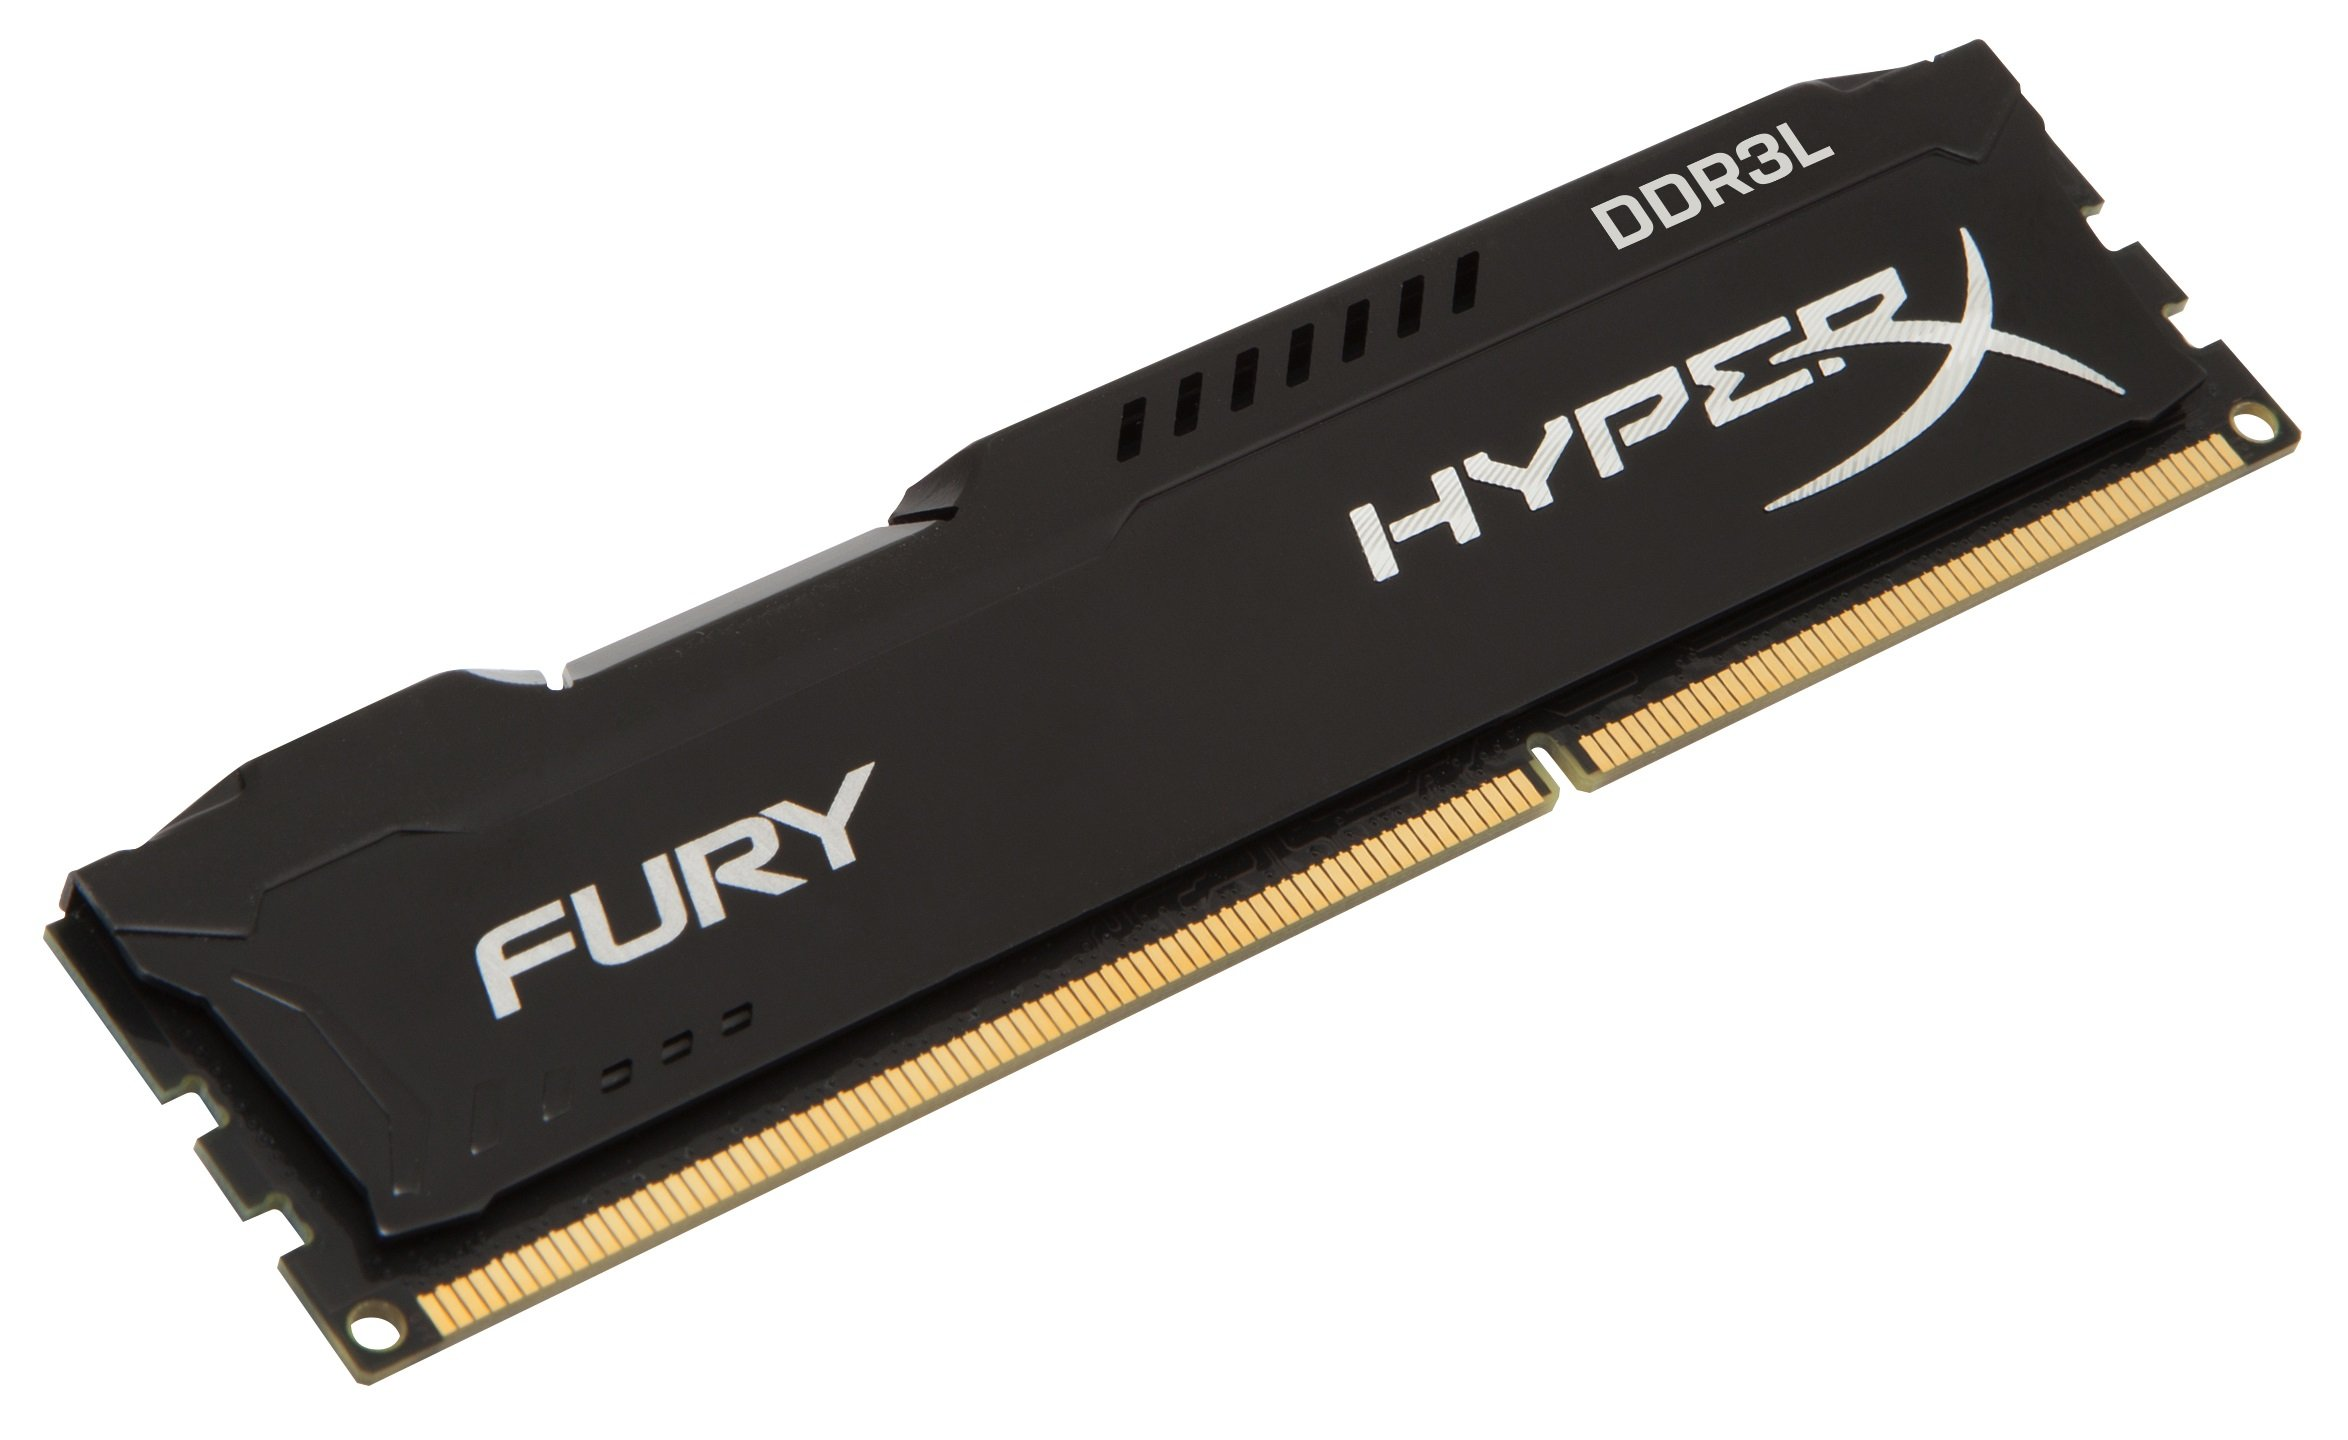 Memoria RAM 4GB HyperX Kingston Technology Fury 1866MHz DDR3L CL11 DIMM 1.35V Low Voltage HX318LC11FB/4 Black